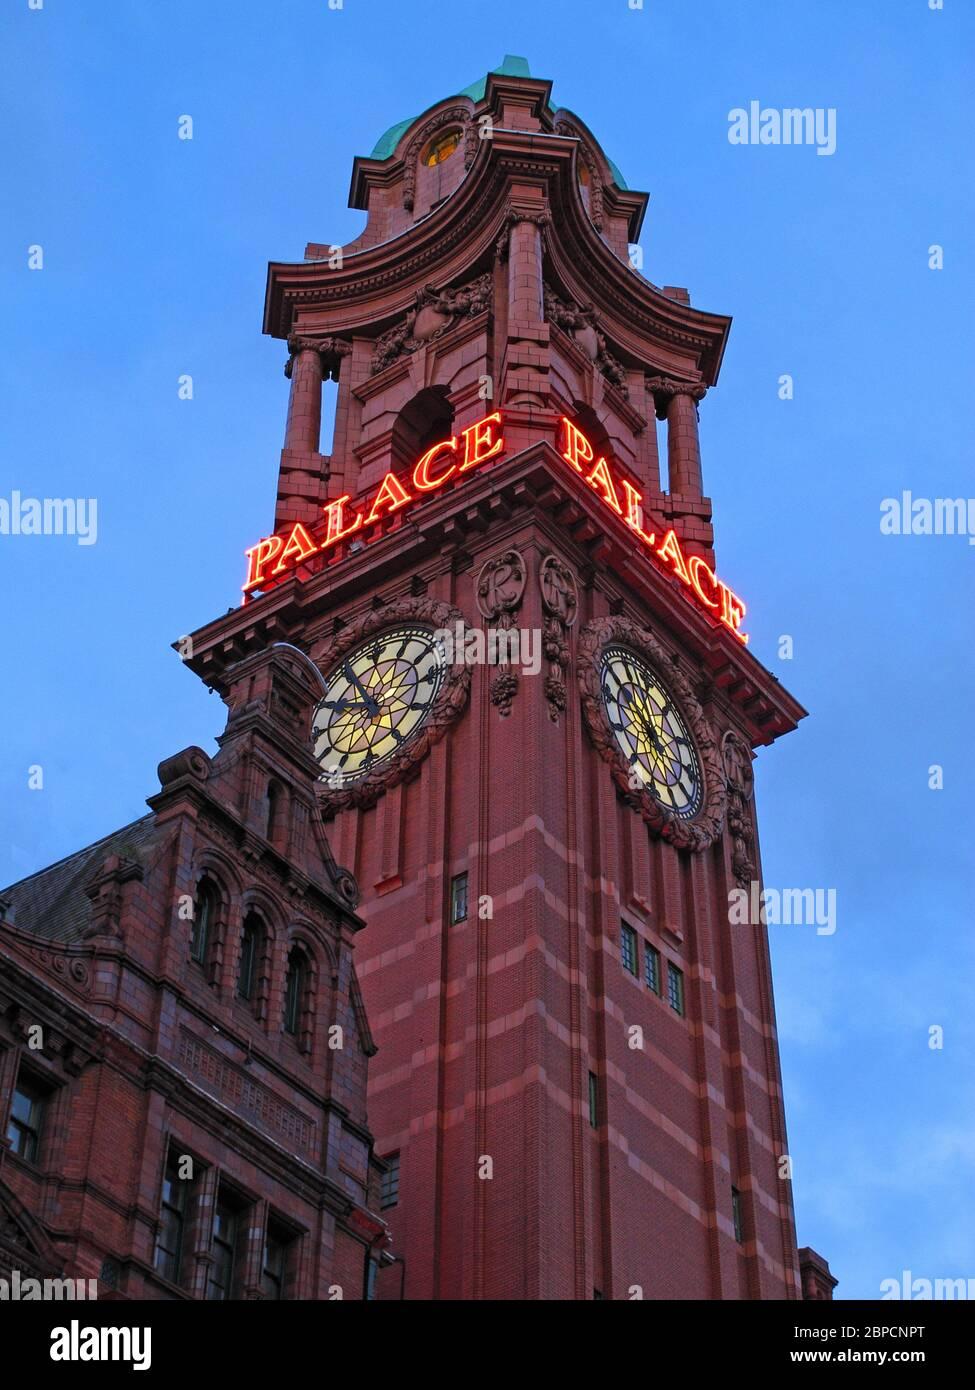 The Palace Hotel, ex-Refuge Insurance building, Oxford Road, Manchester, Lancashire, England,UK, M60 7HA Stock Photo